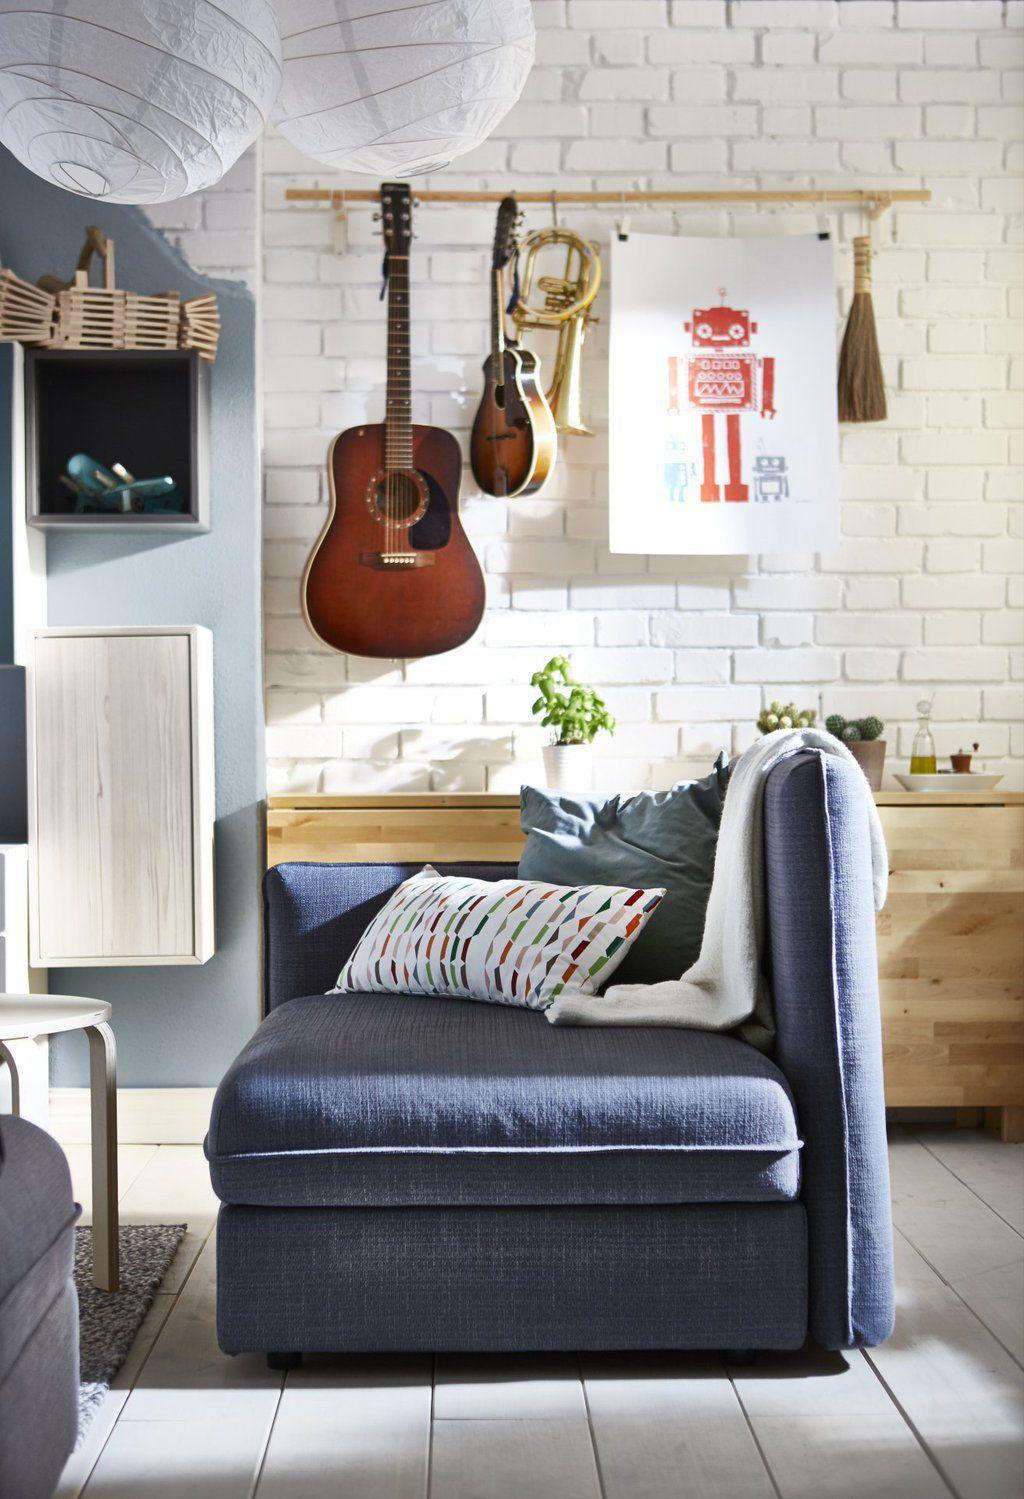 Anteprima catalogo ikea 2017 i divani componibili vallentuna una casa così